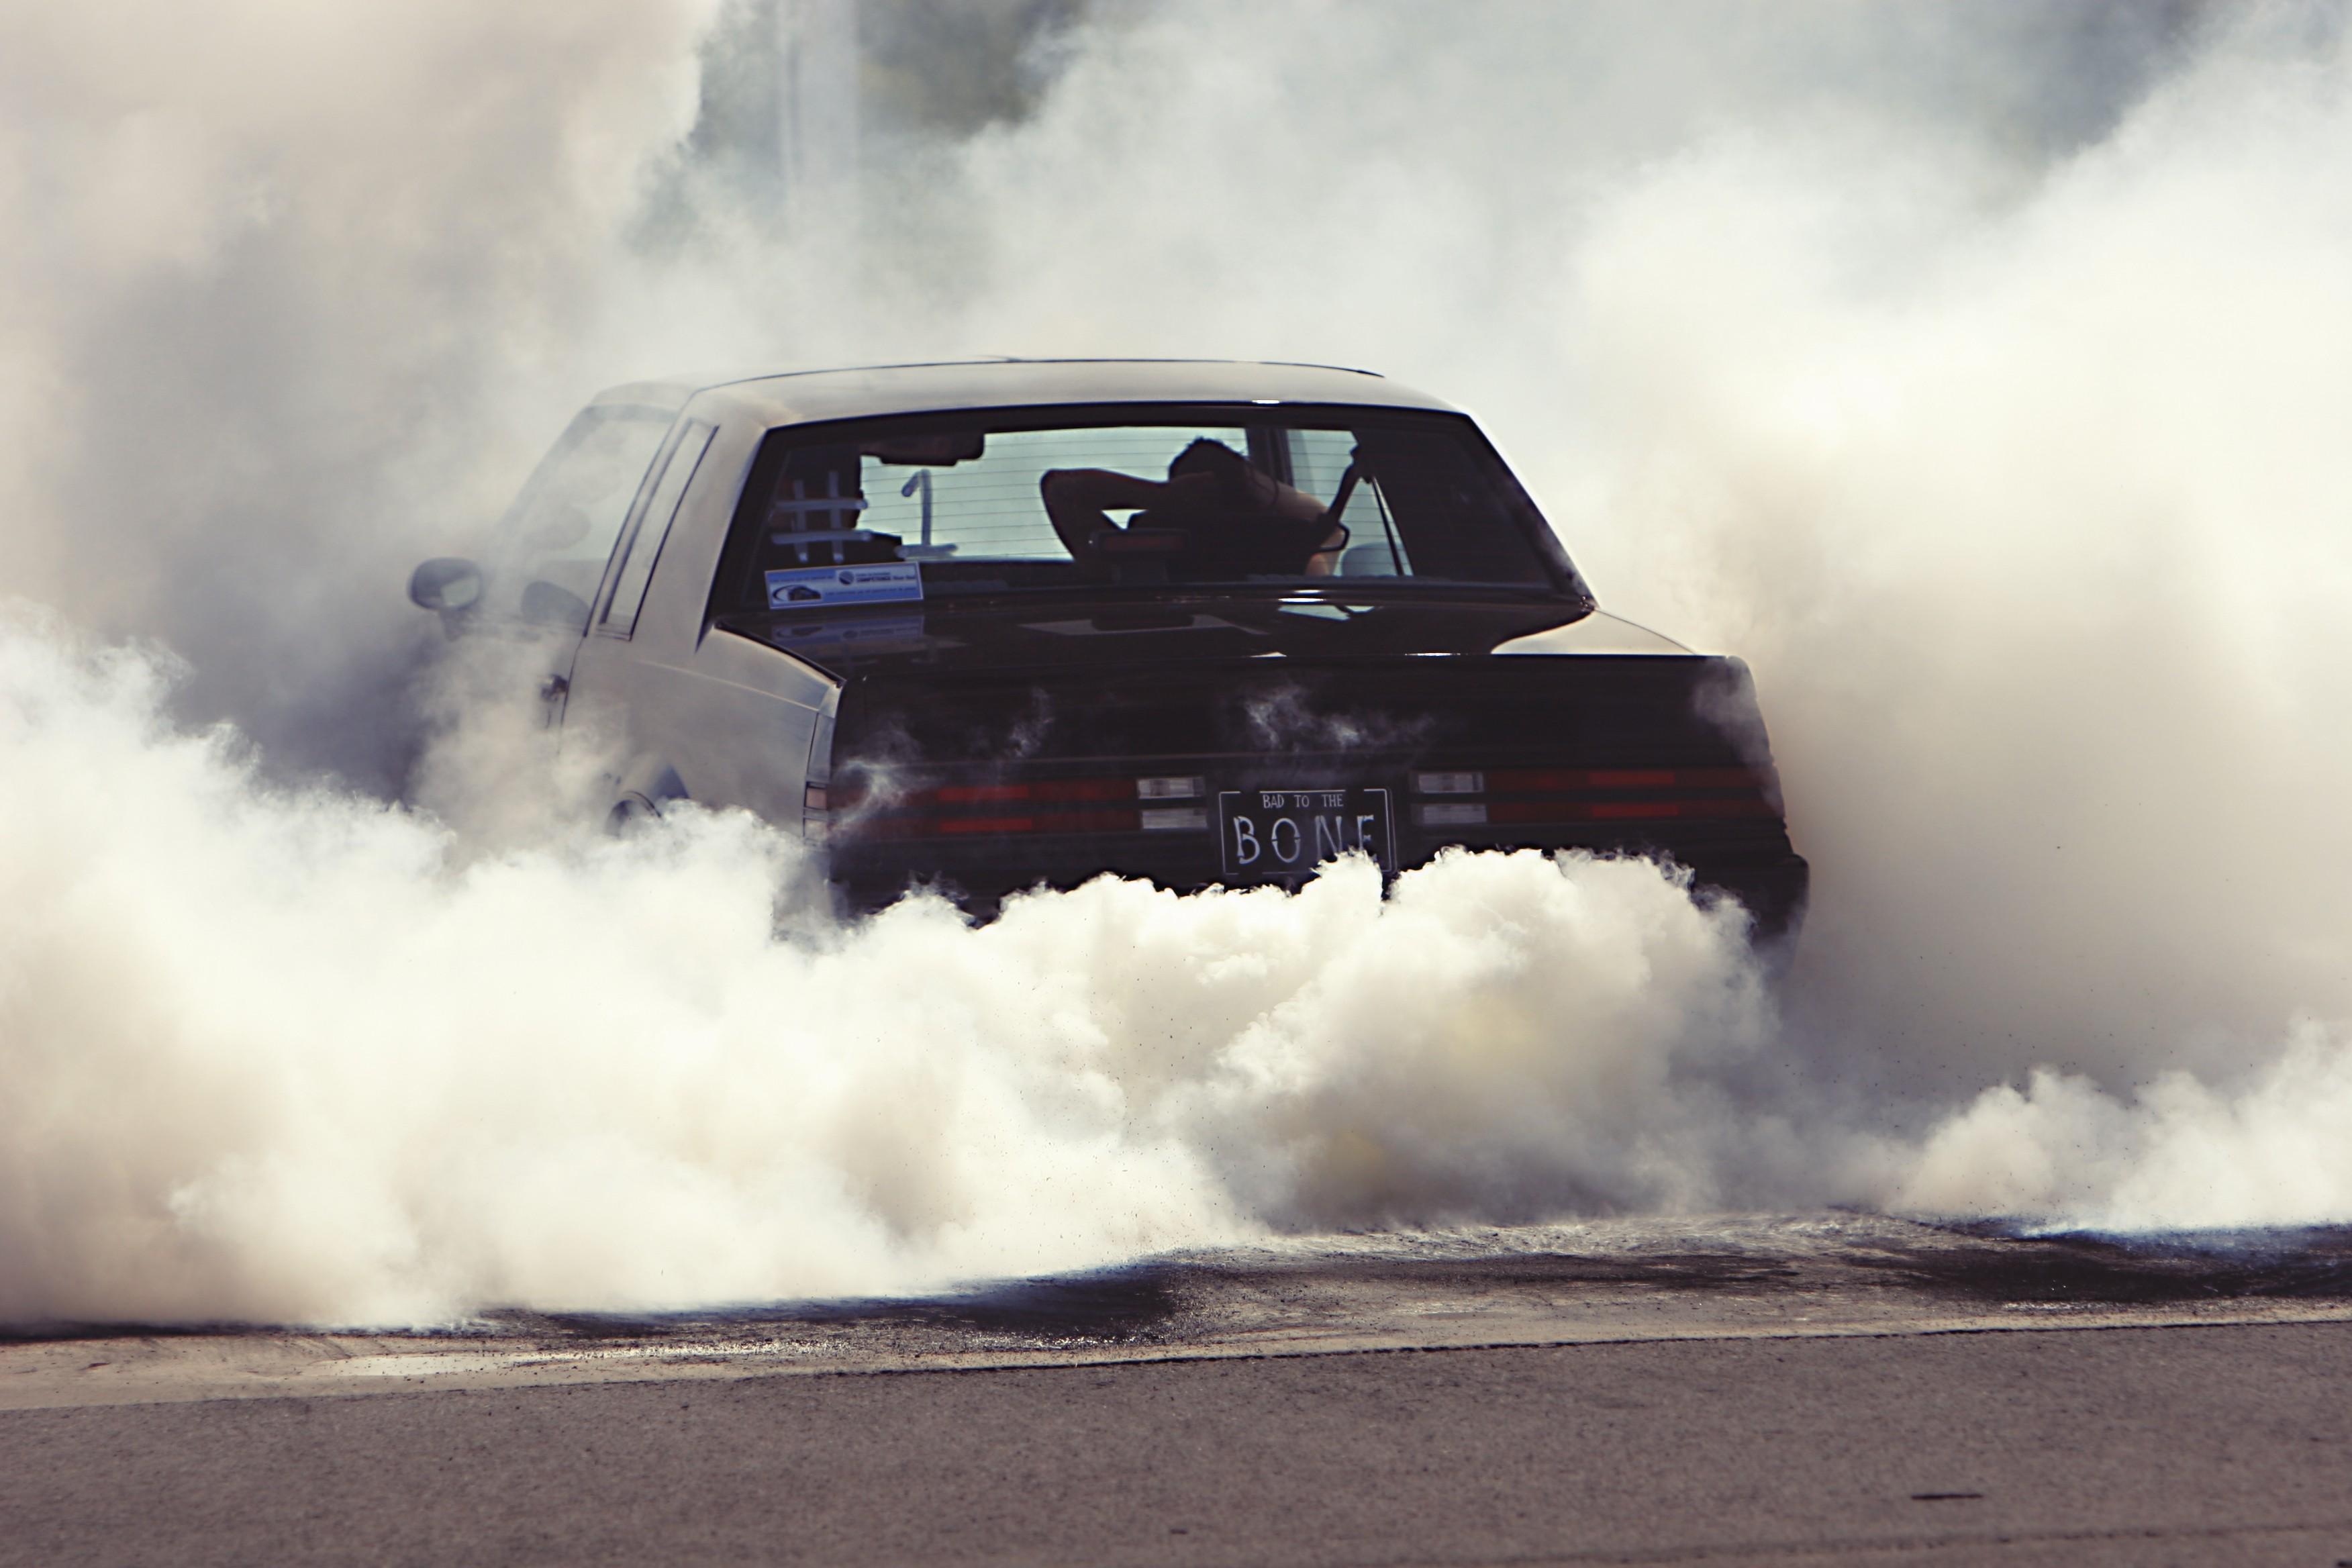 Wallpaper Car Vehicle Smoke Burnout Driving Screenshot